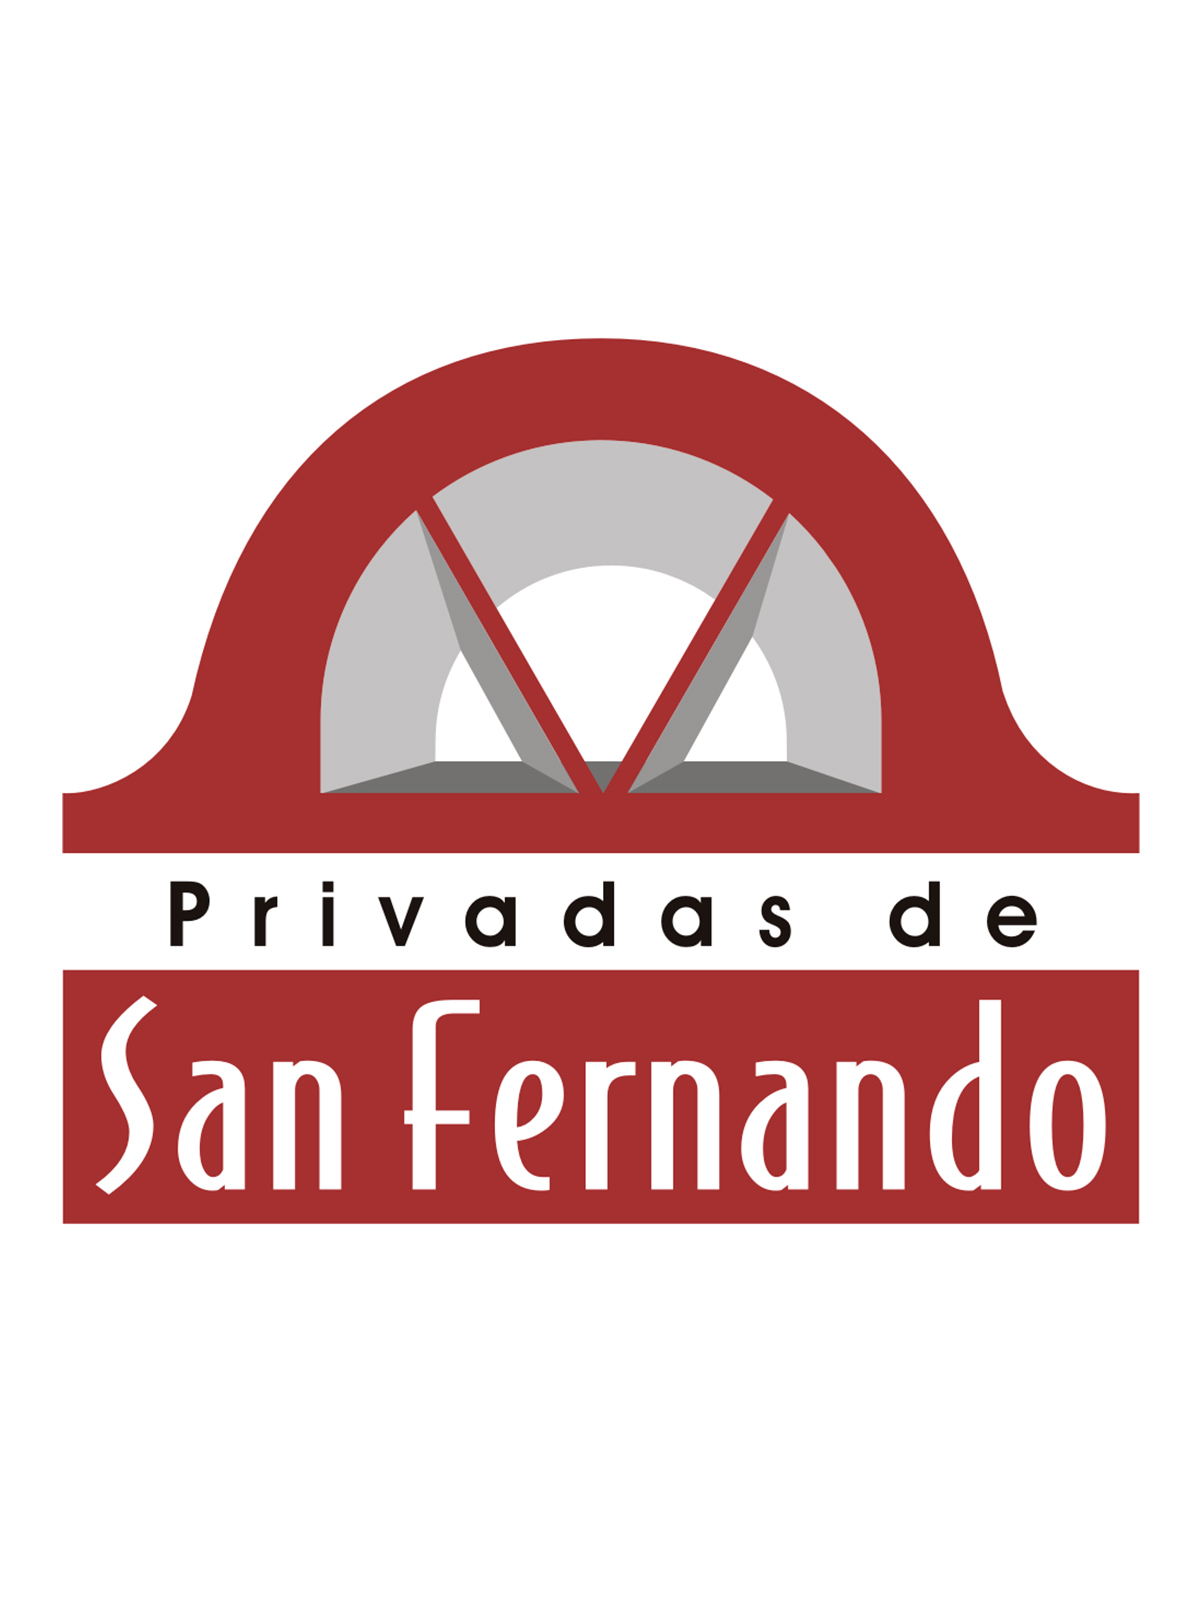 privadas-de-san-fernando_logo